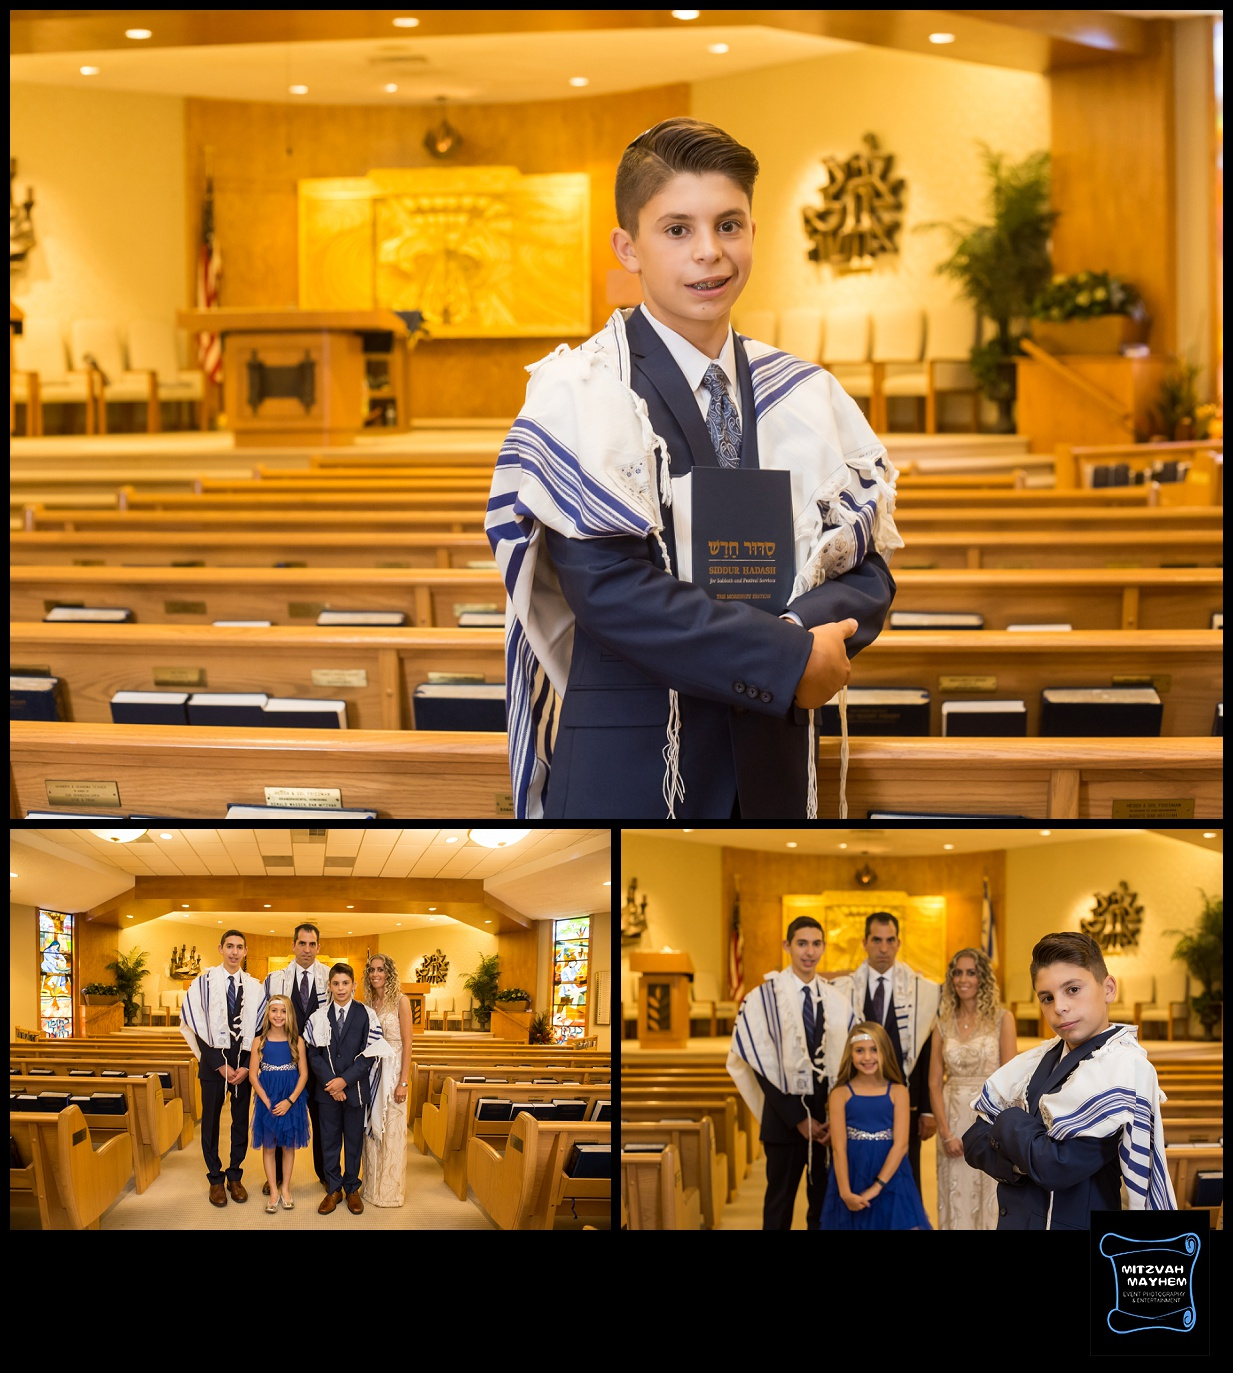 bnai-tikvah-bar-mitzvah-photographer-7902.JPG